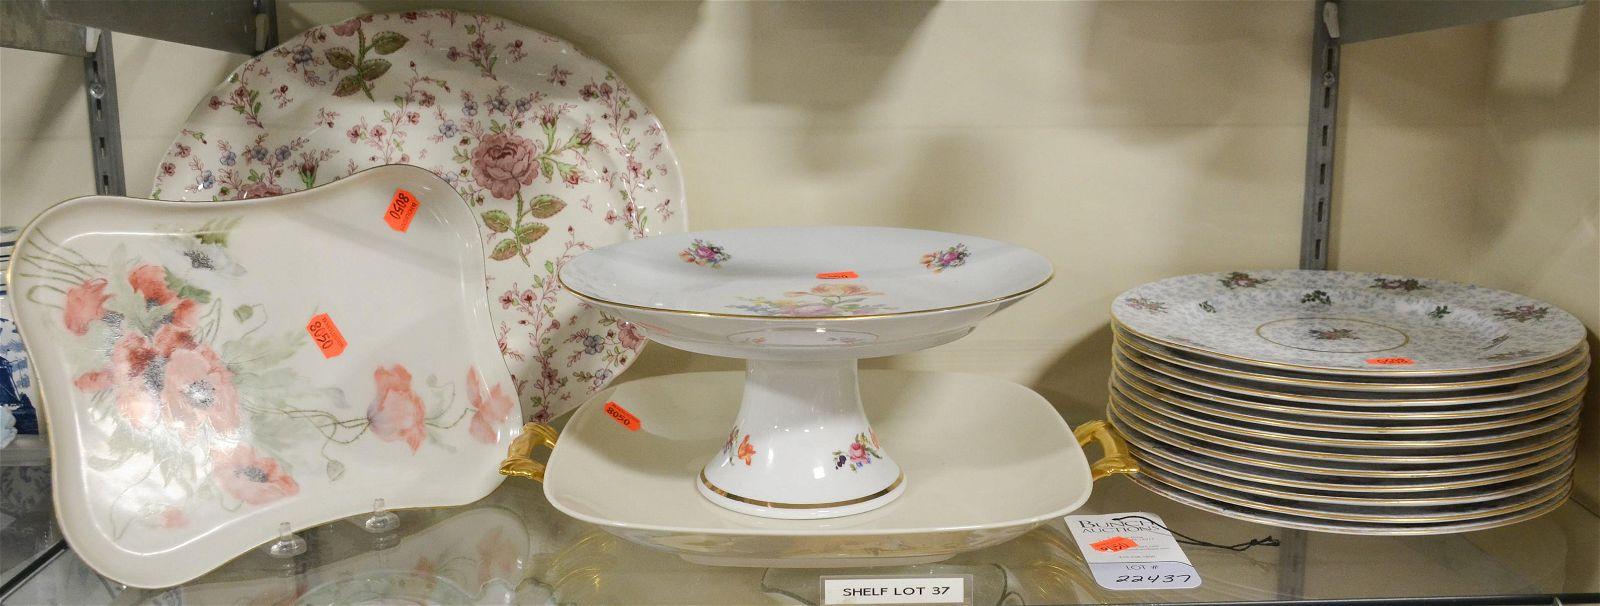 Shelf #37 - (16) Pcs Porcelain